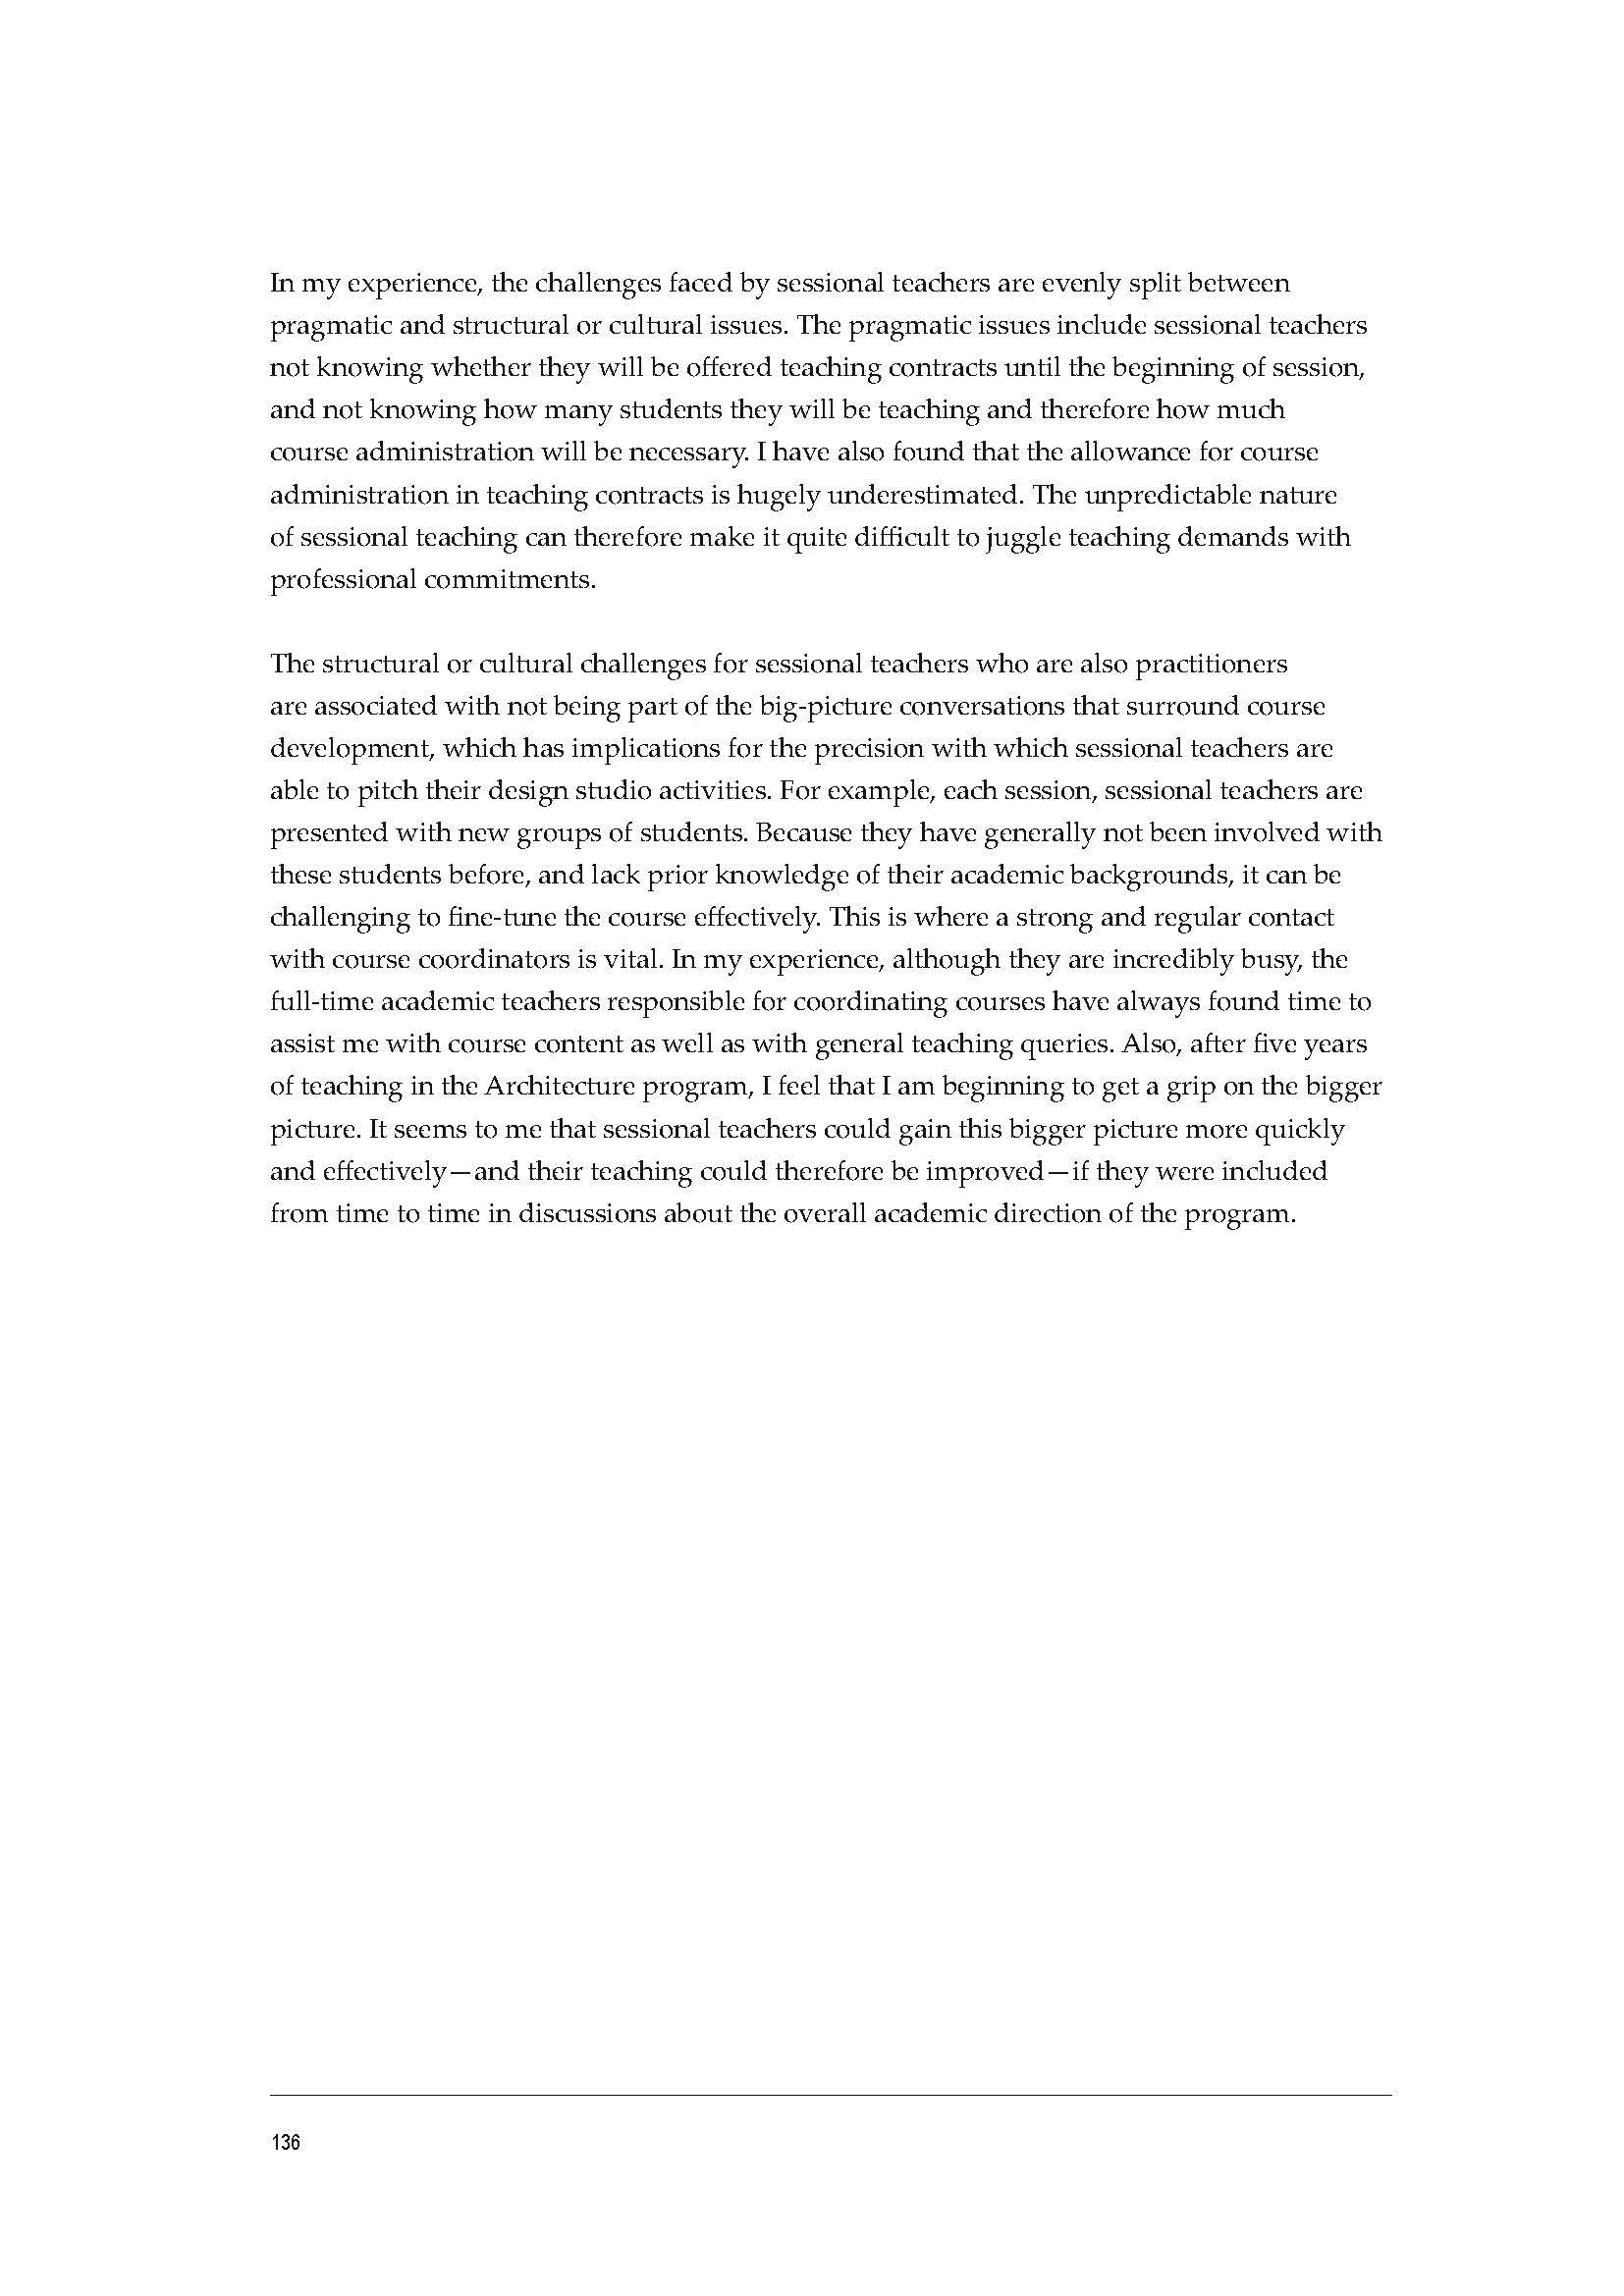 UNSW_Compendium_Issue4_Feb07_Page_7.jpg